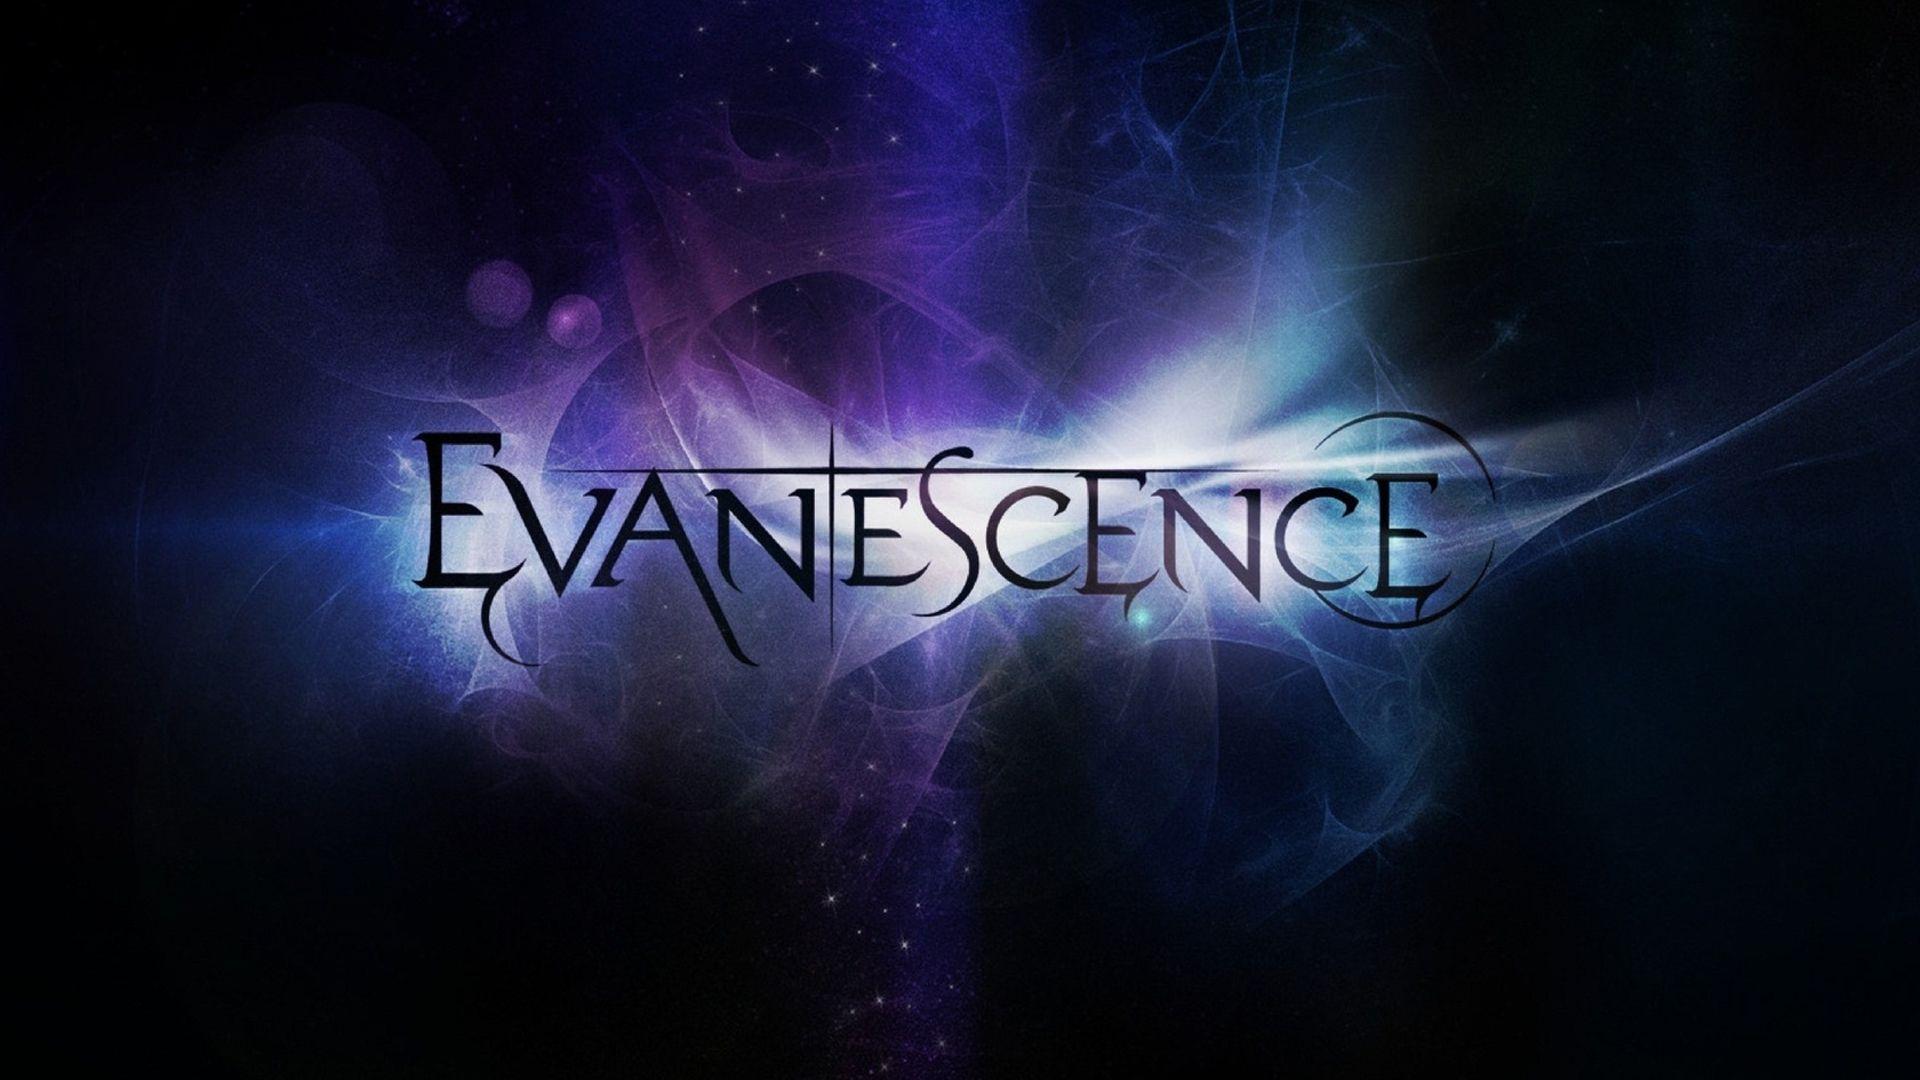 Evanescence logo evanescence logo hd wallpaper this is absolutely evanescence logo evanescence logo hd wallpaper this is absolutely one of my faves biocorpaavc Image collections